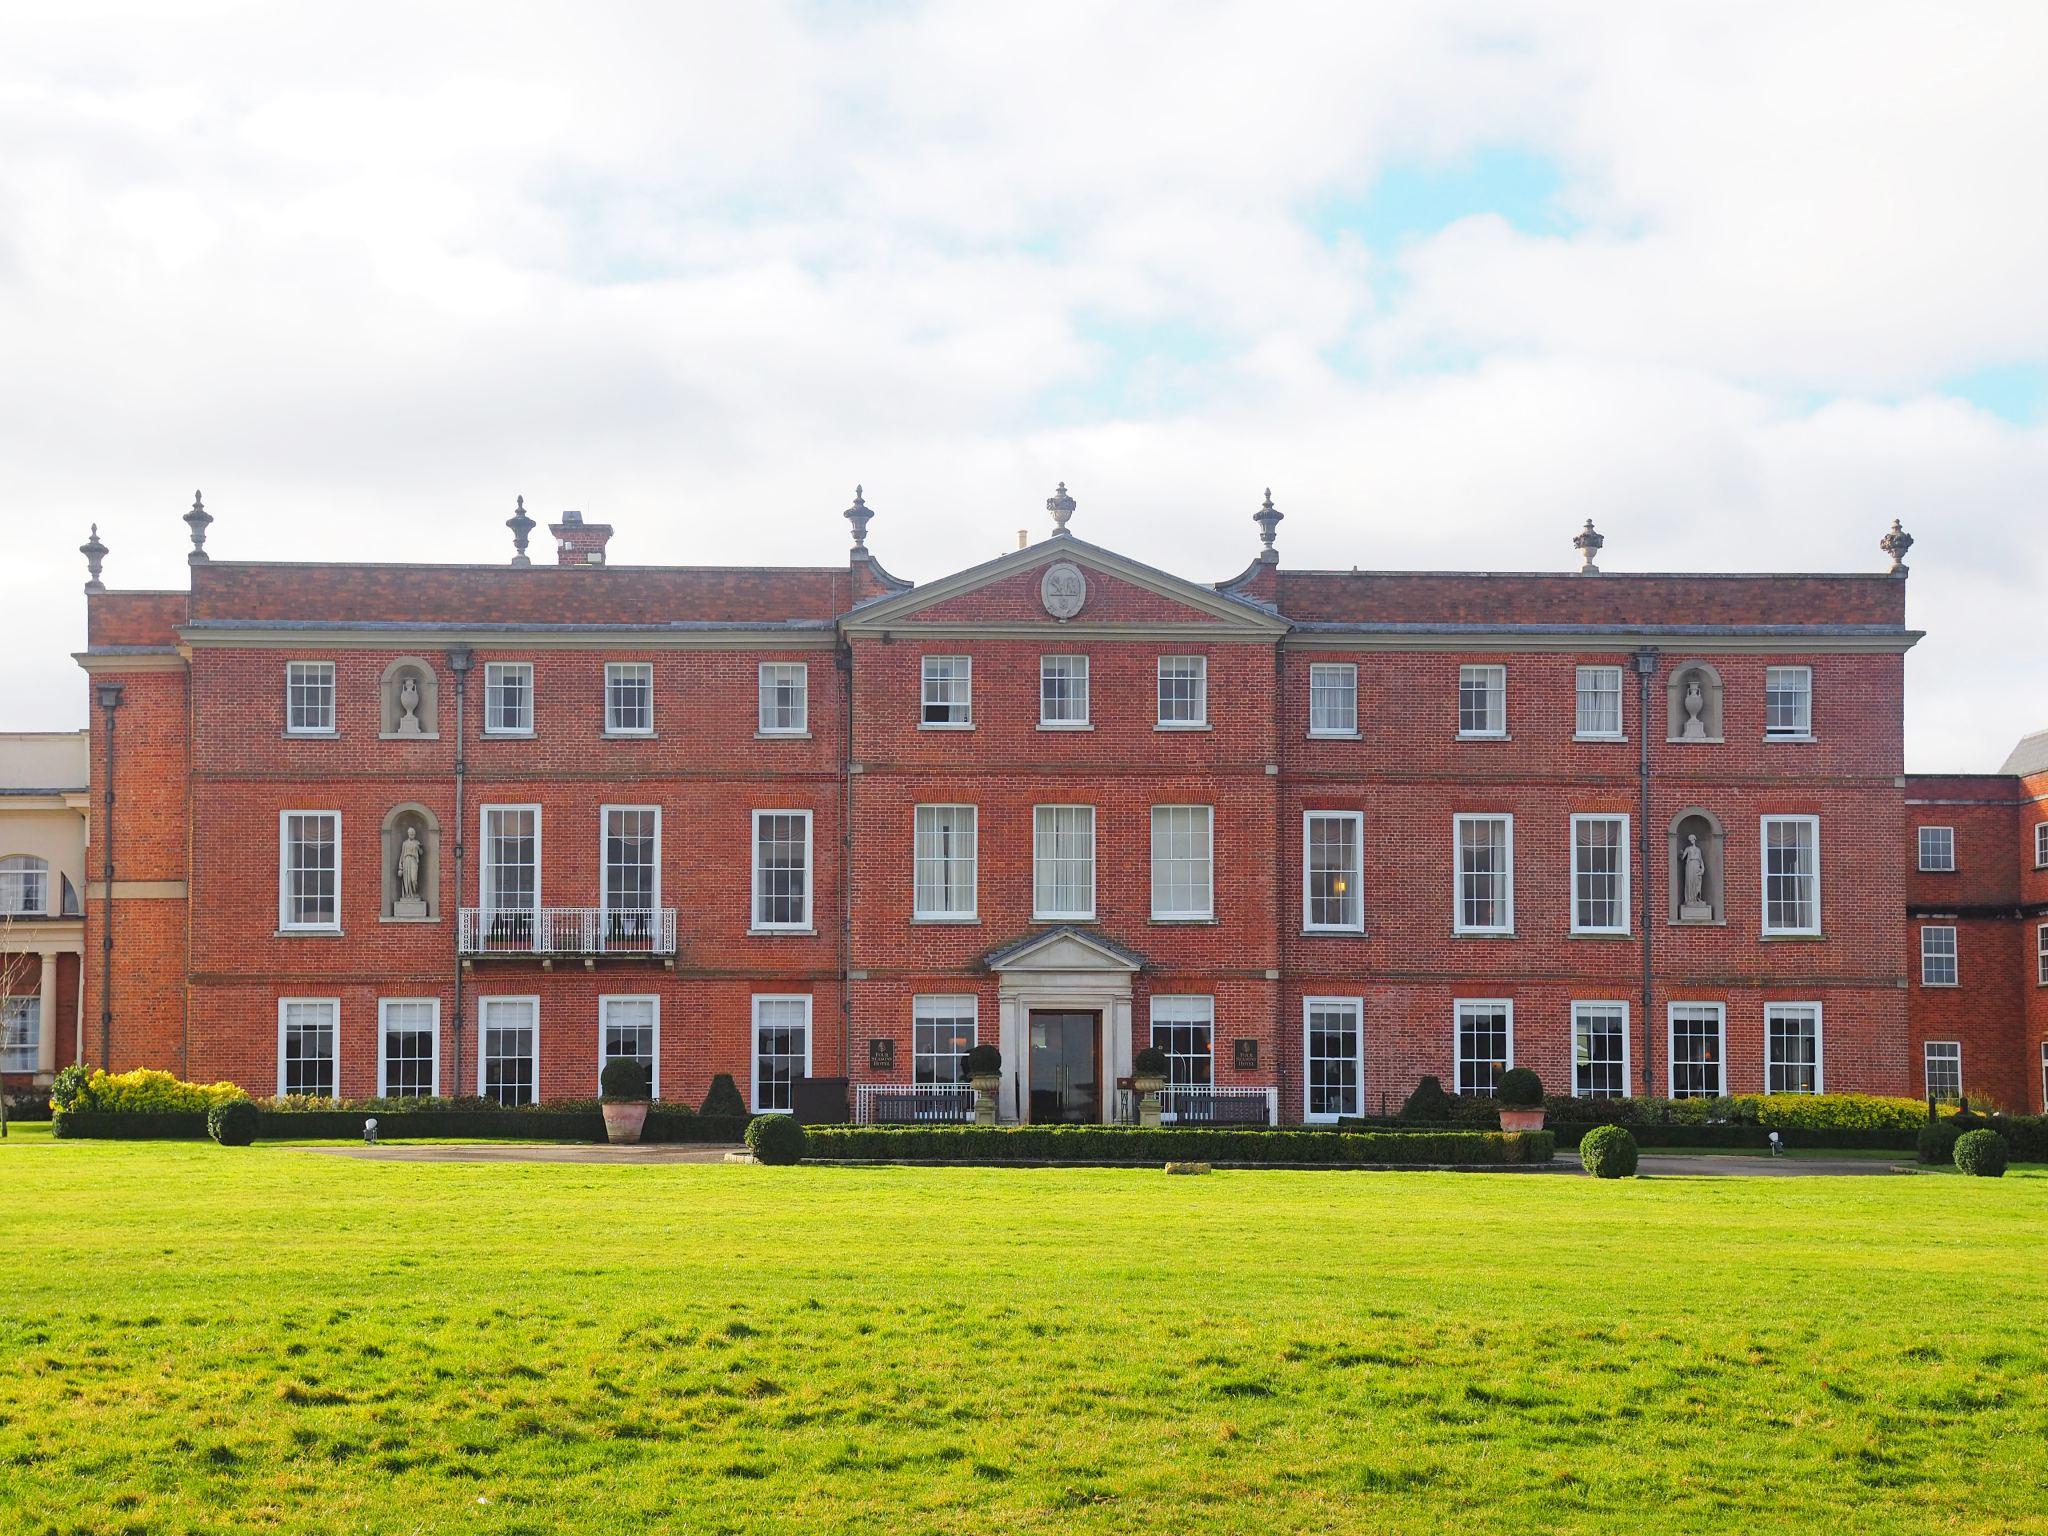 Luxury Four Seasons Hampshire